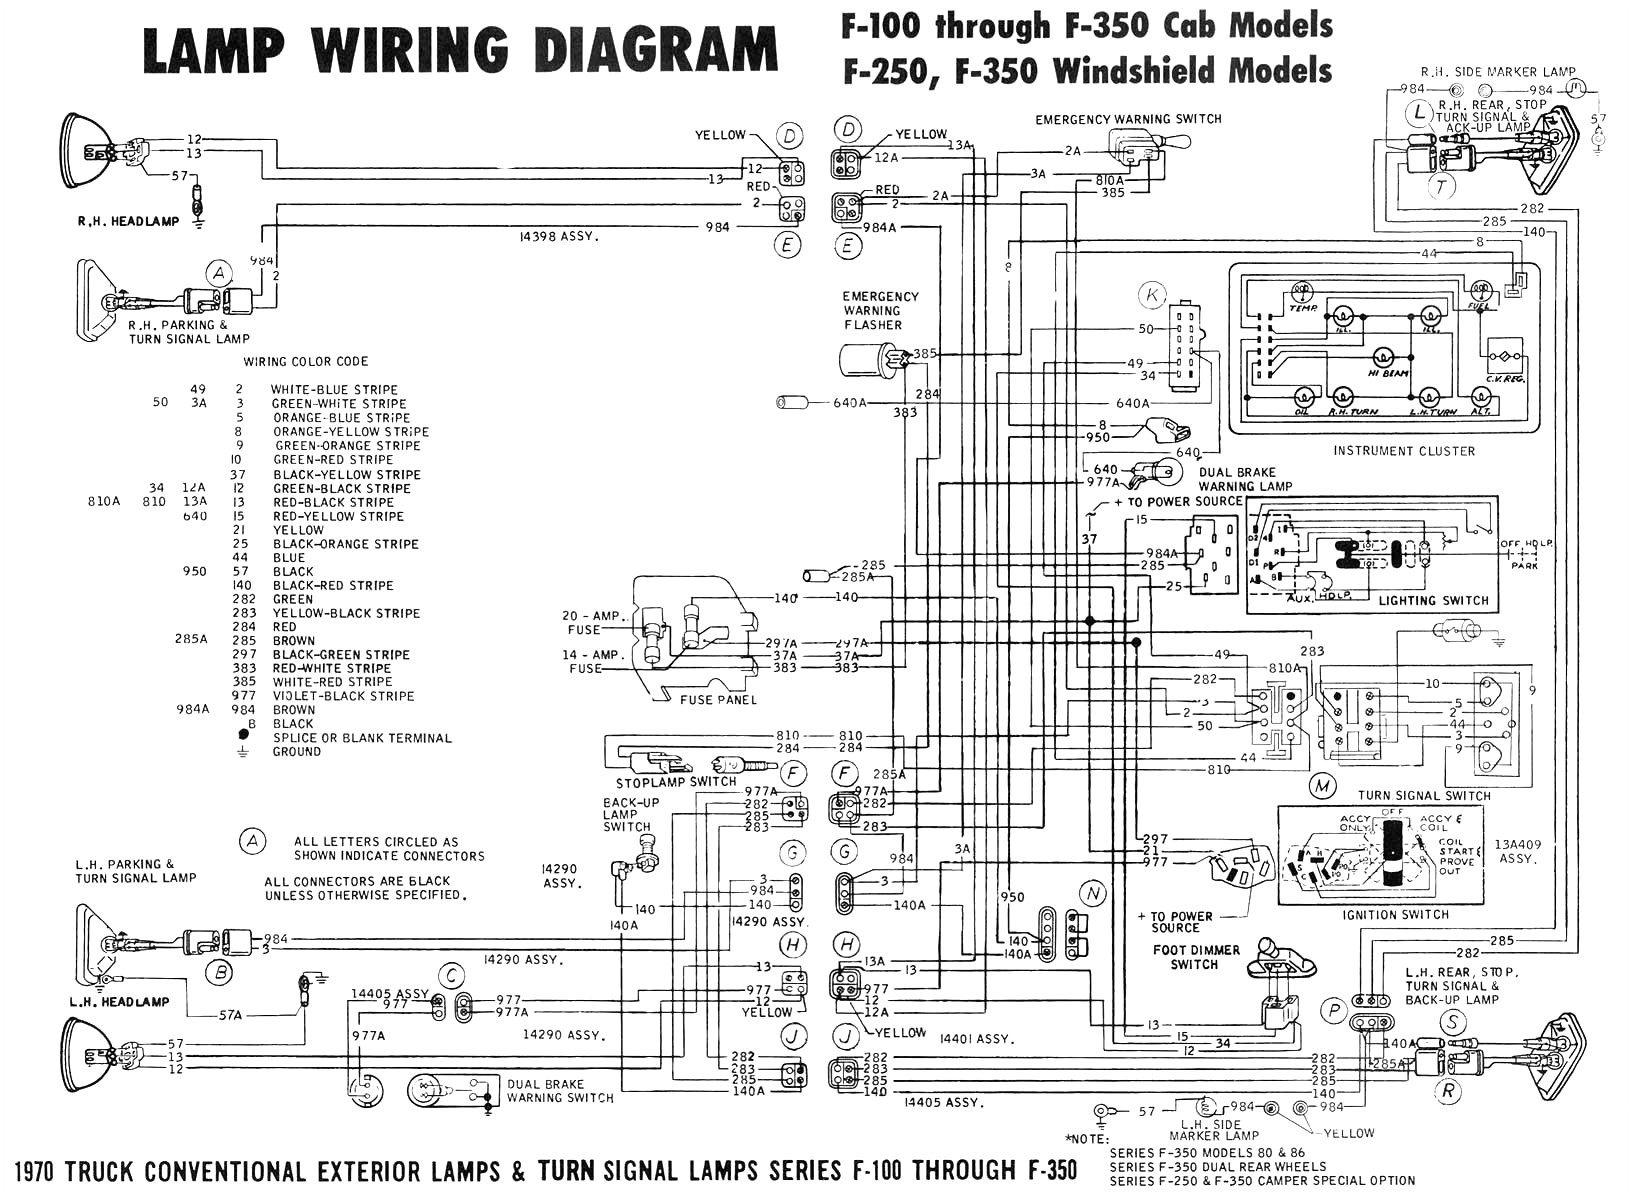 2005 mini cooper fuse box free download wiring diagrams wiring mix wiring diagrams for lighting circuits